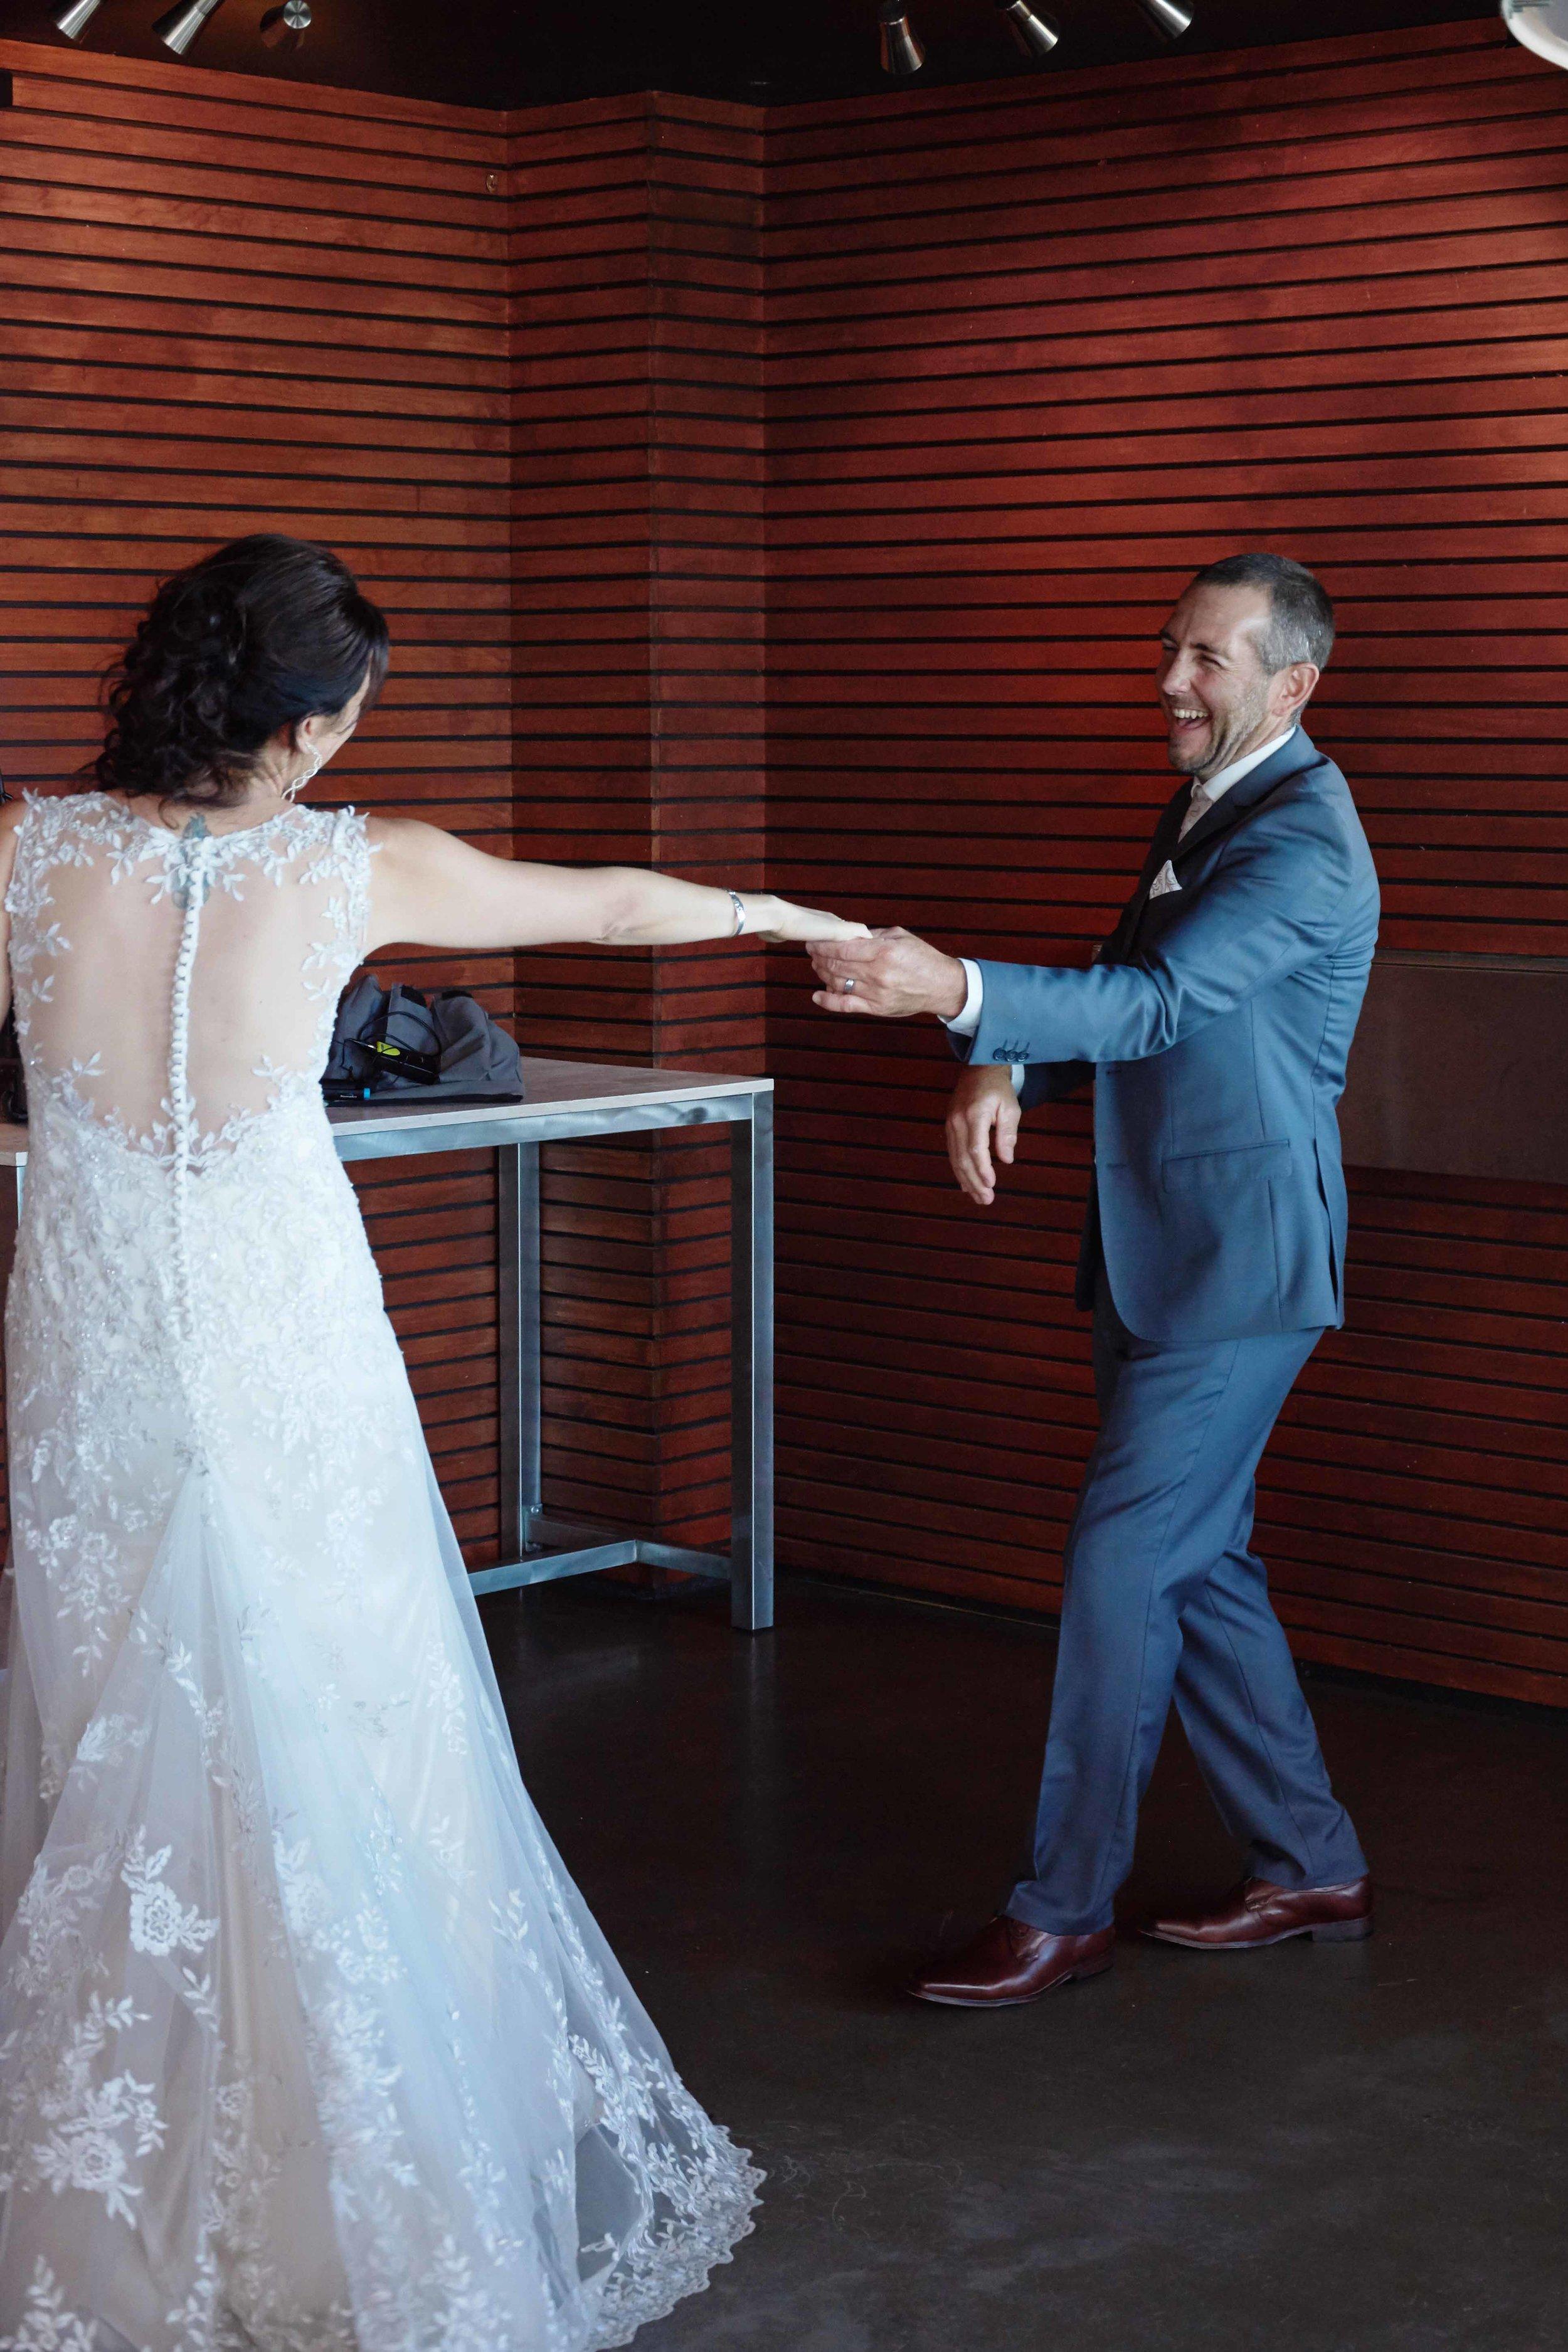 sorrento-wedding-photography-all-smiles-marissa-jade-photography-80.jpg